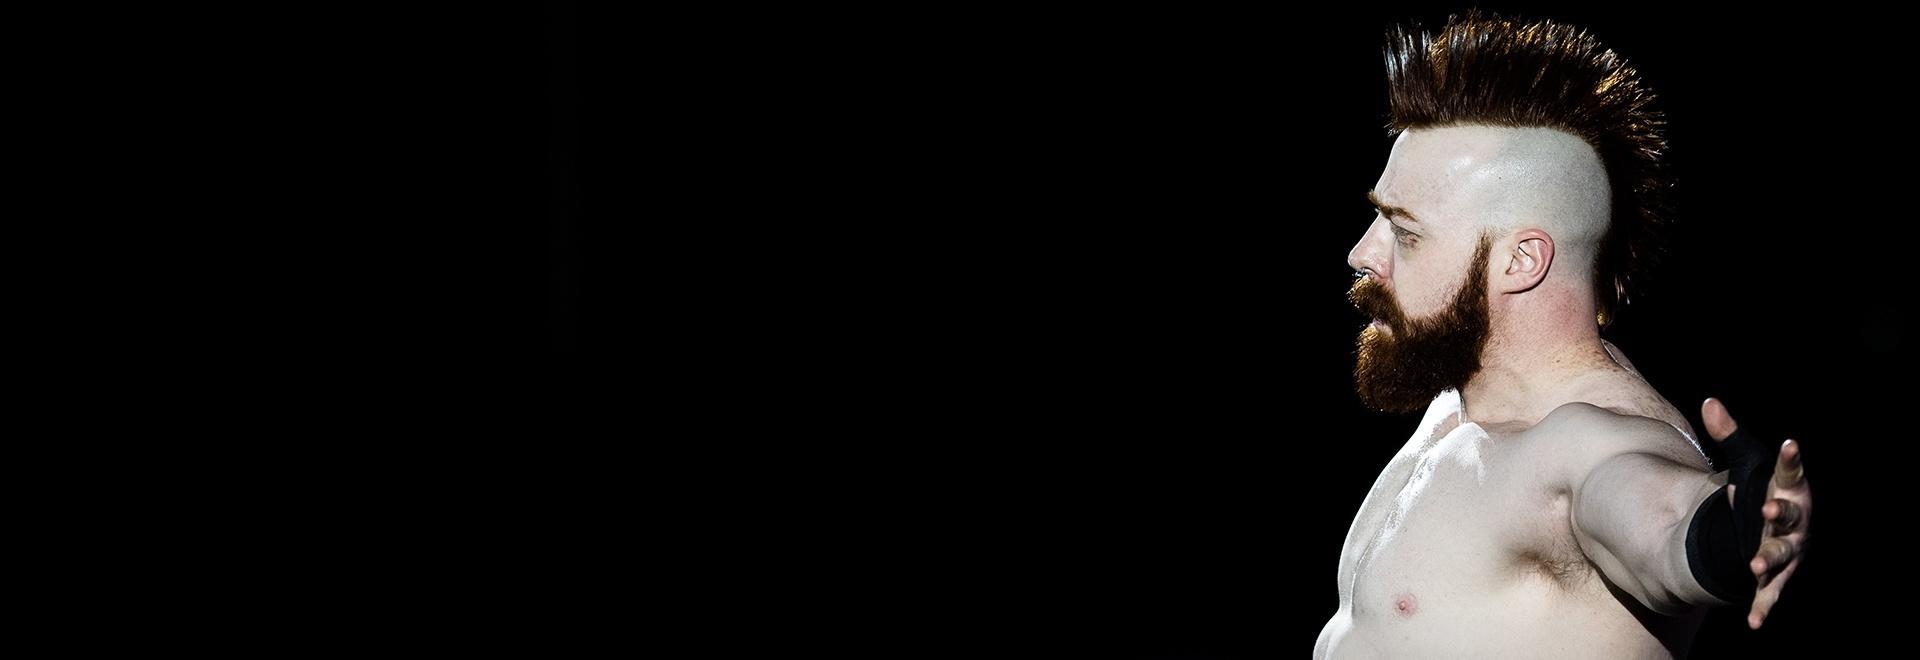 Ep. 35